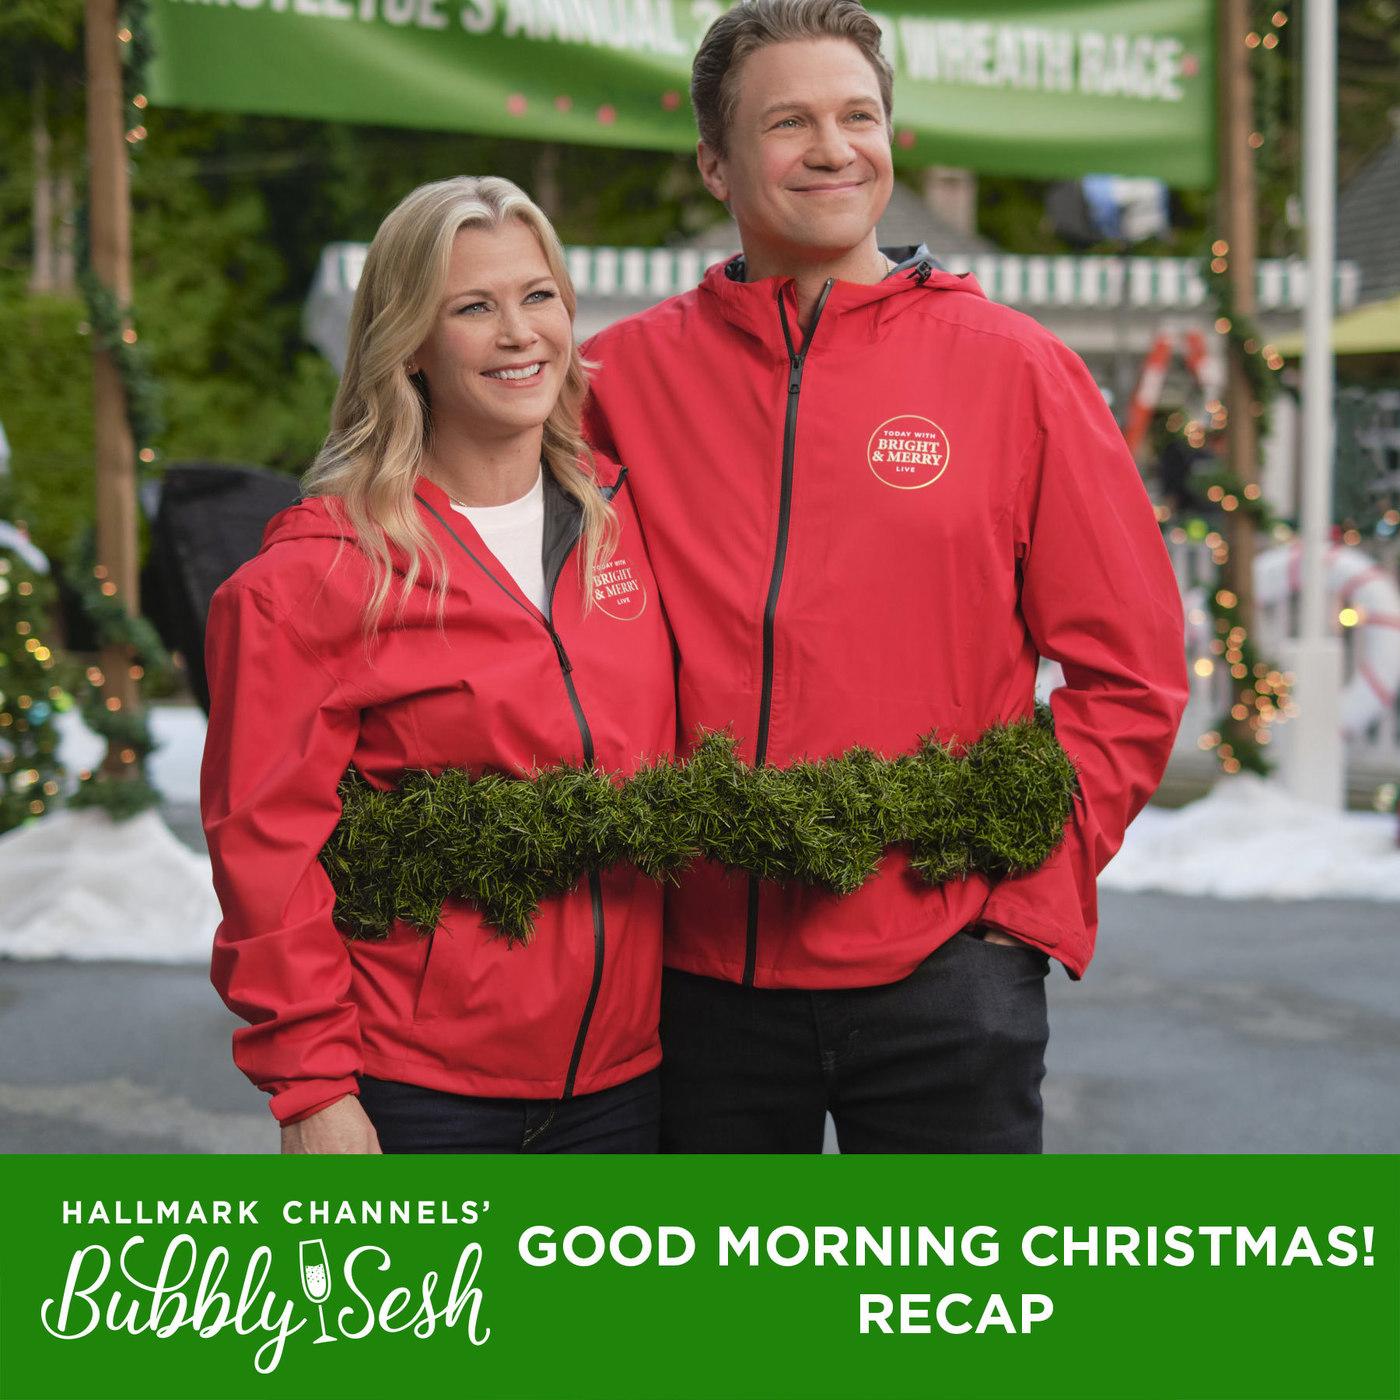 Good Morning Christmas! Recap